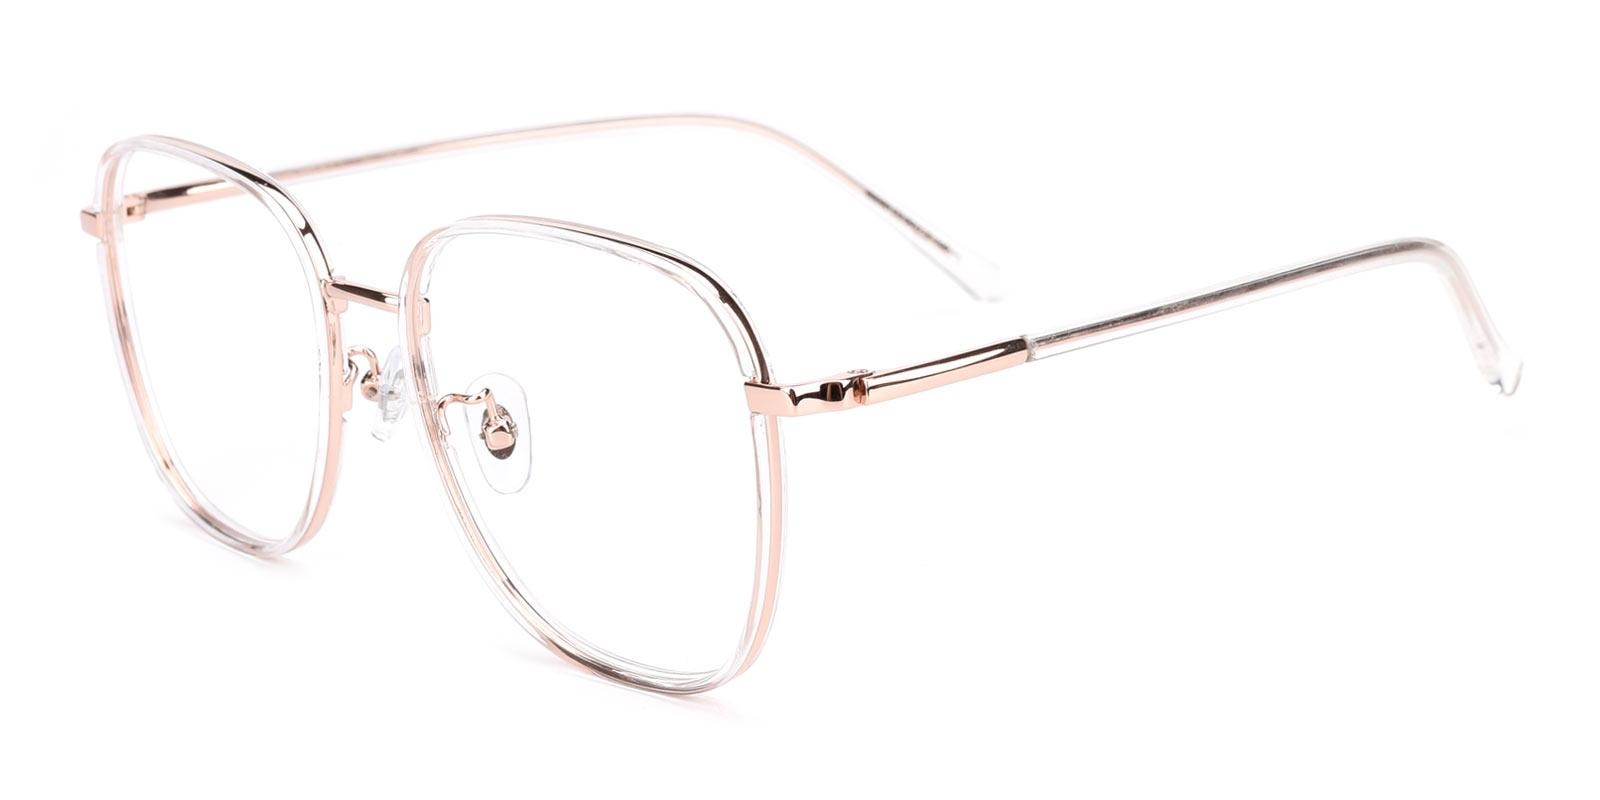 Diodes-Translucent-Square-TR-Eyeglasses-detail